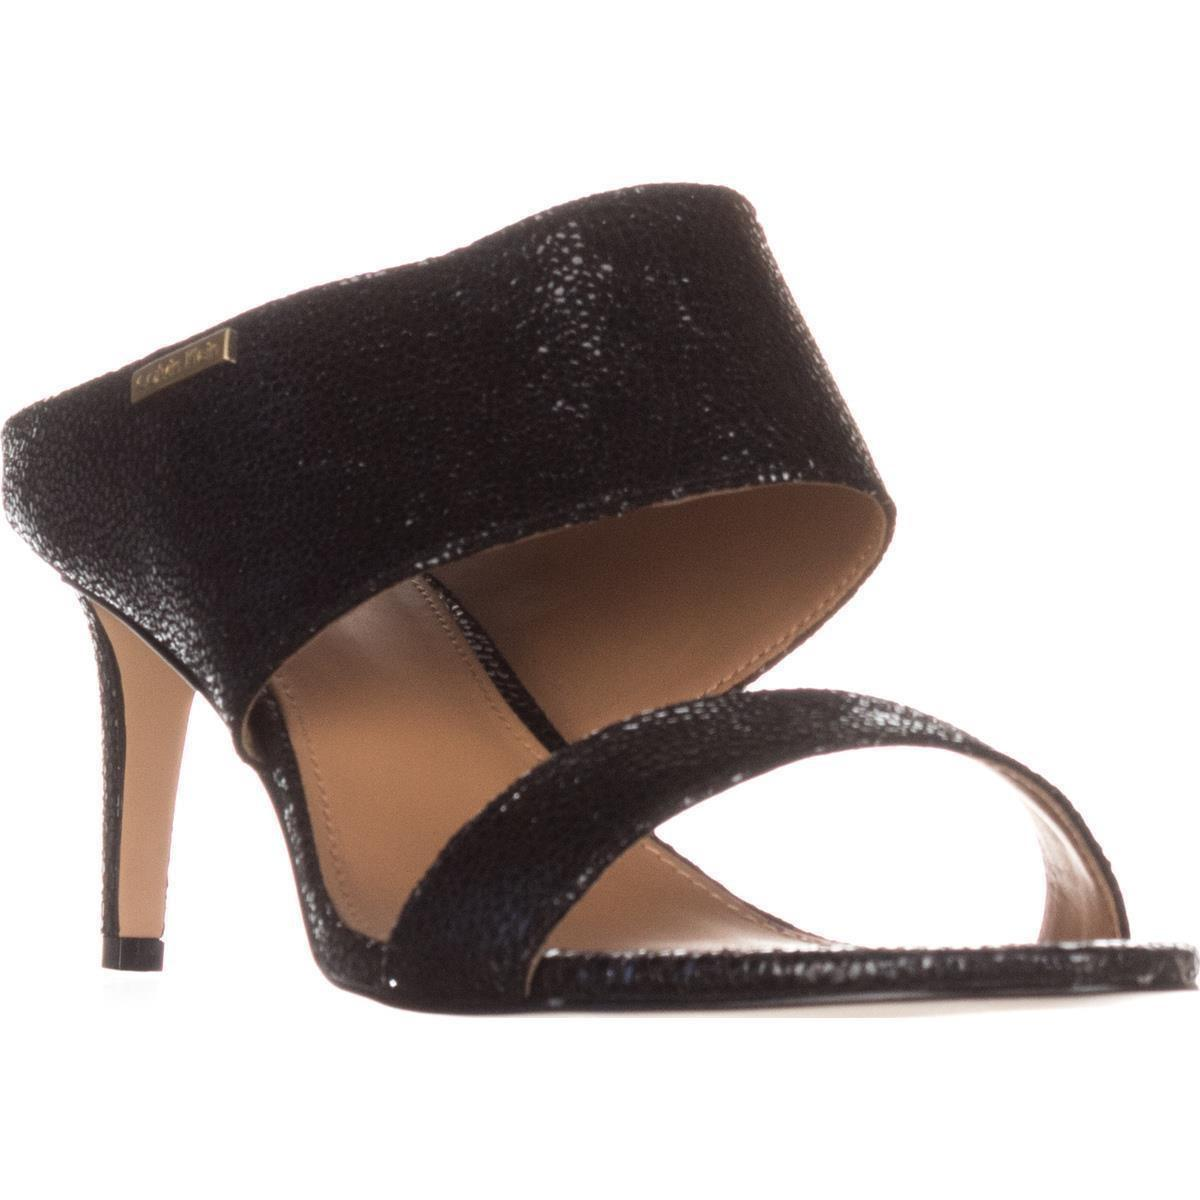 05a4e085c1c Lyst - Calvin Klein 205W39Nyc Cecily Wide-strap Mule Sandals in Black